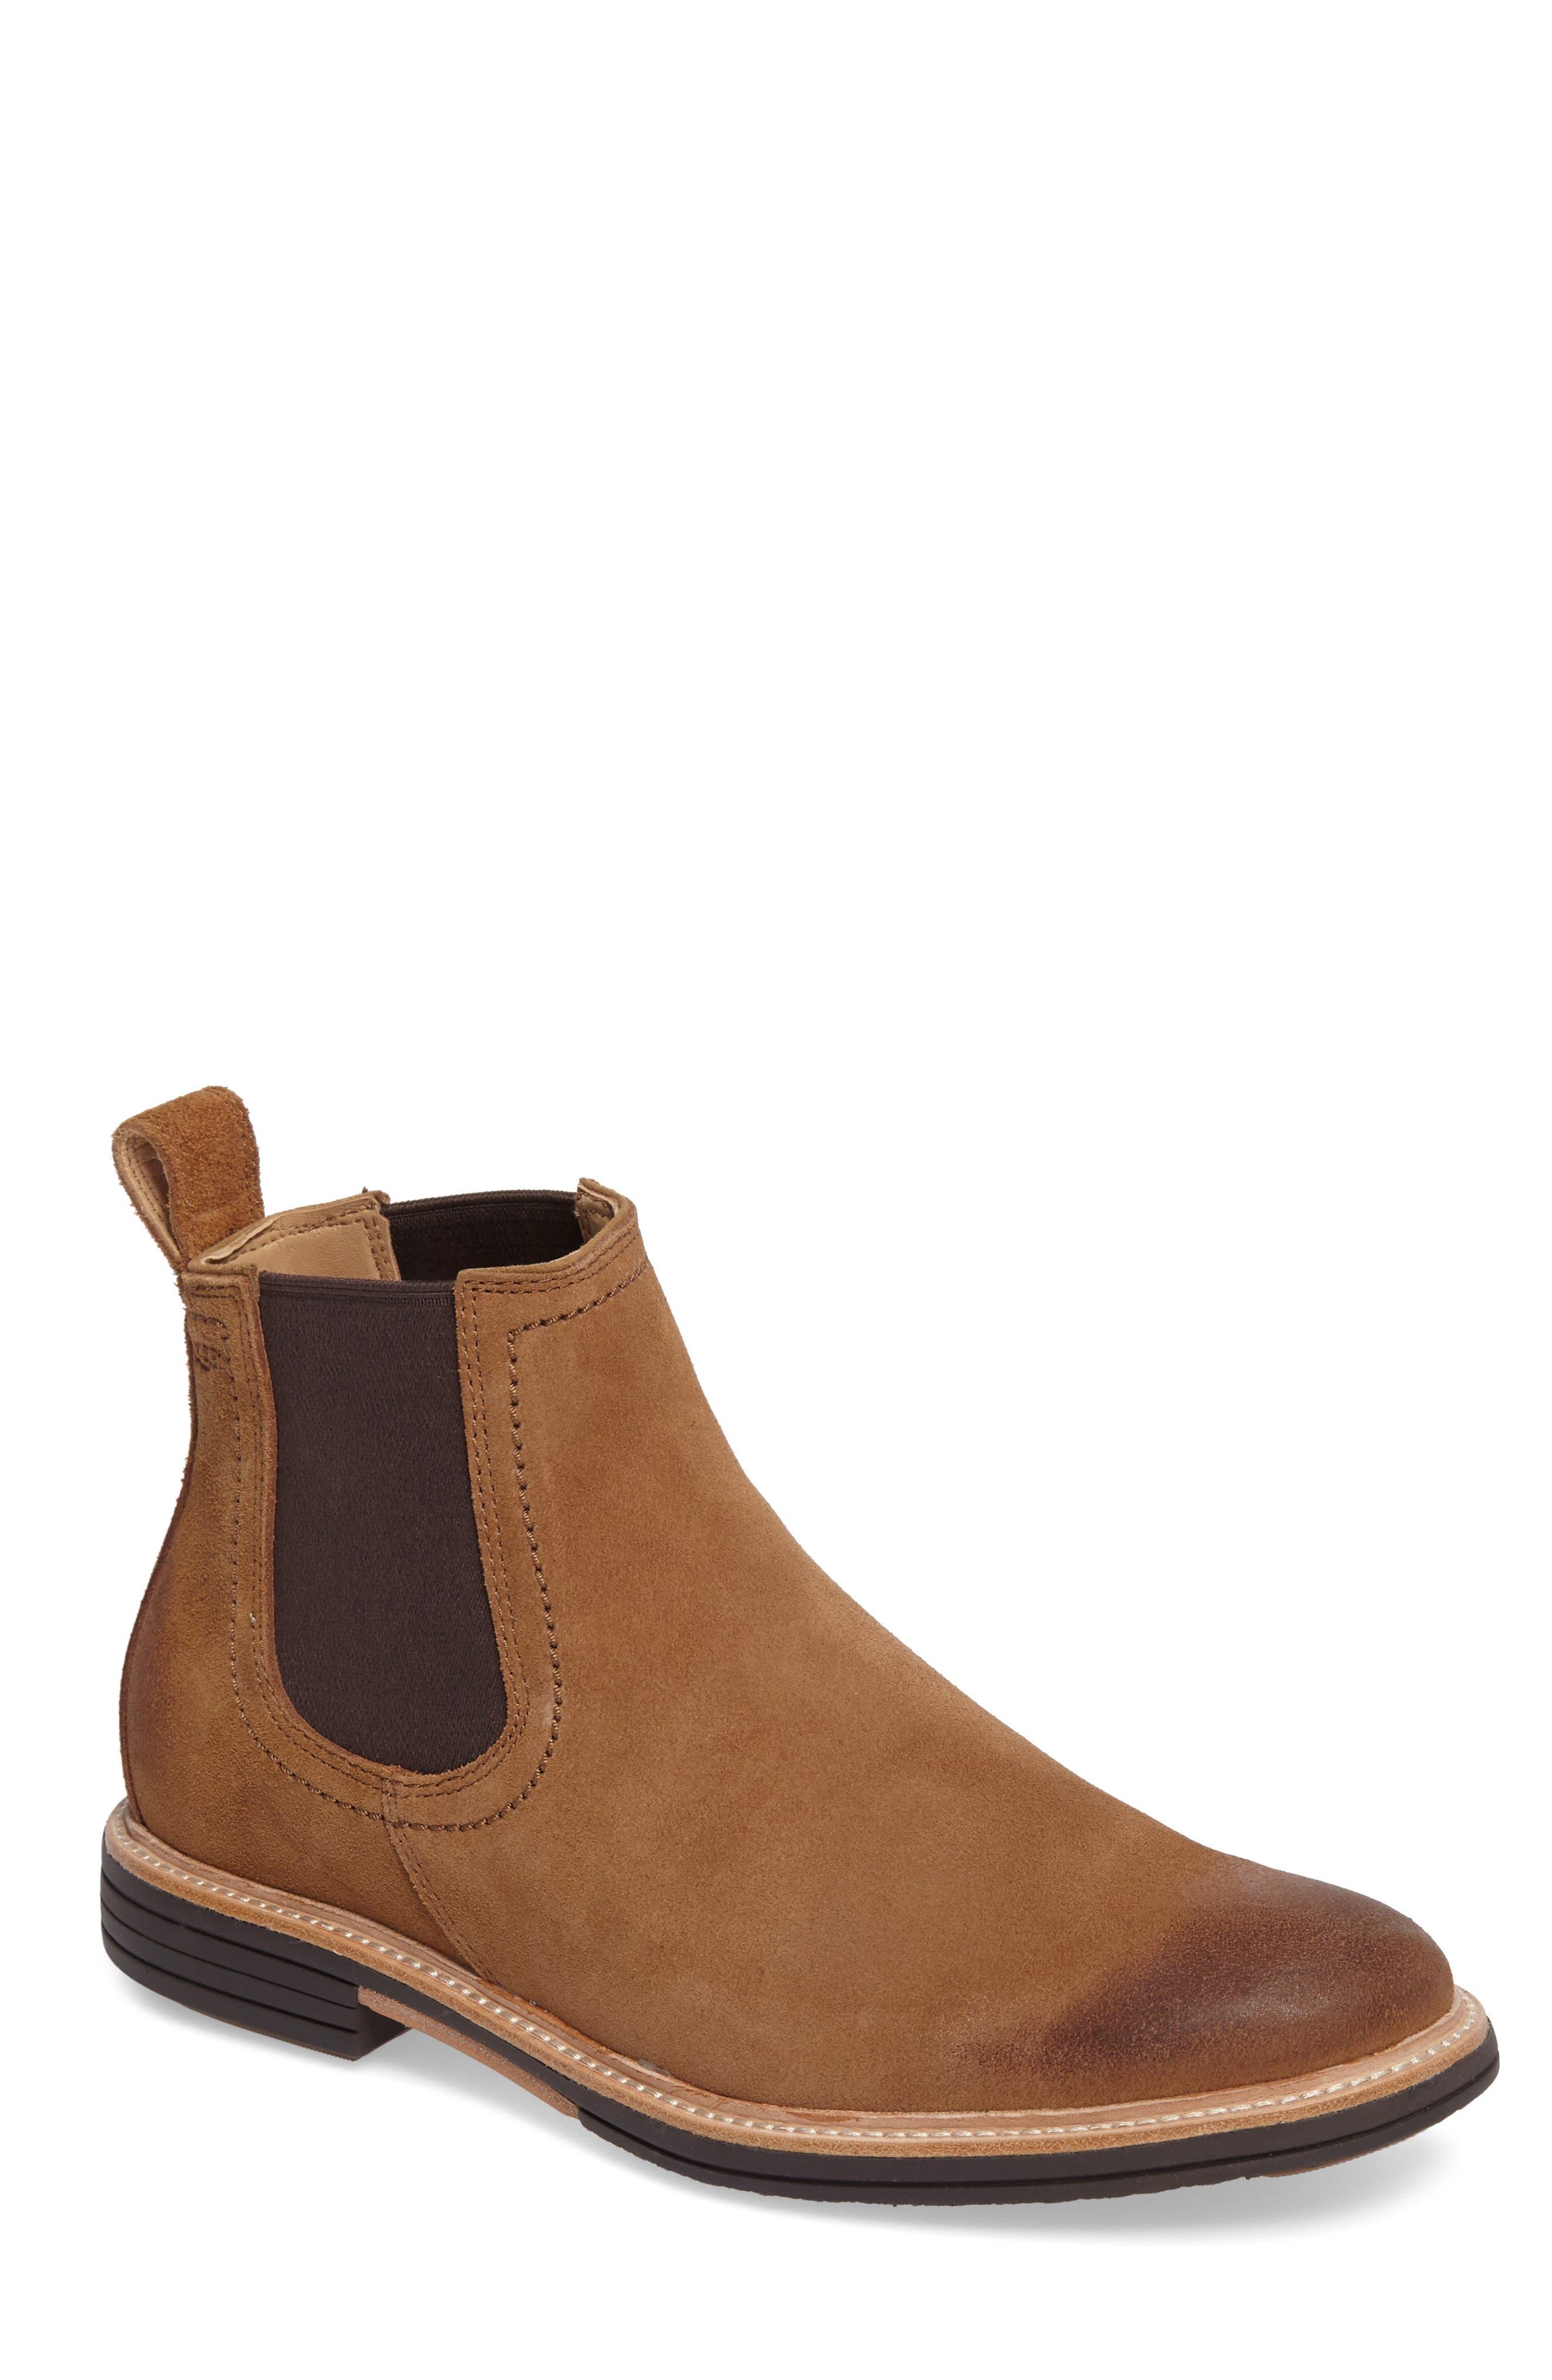 Main Image - UGG® Baldvin Chelsea Boot (Men)